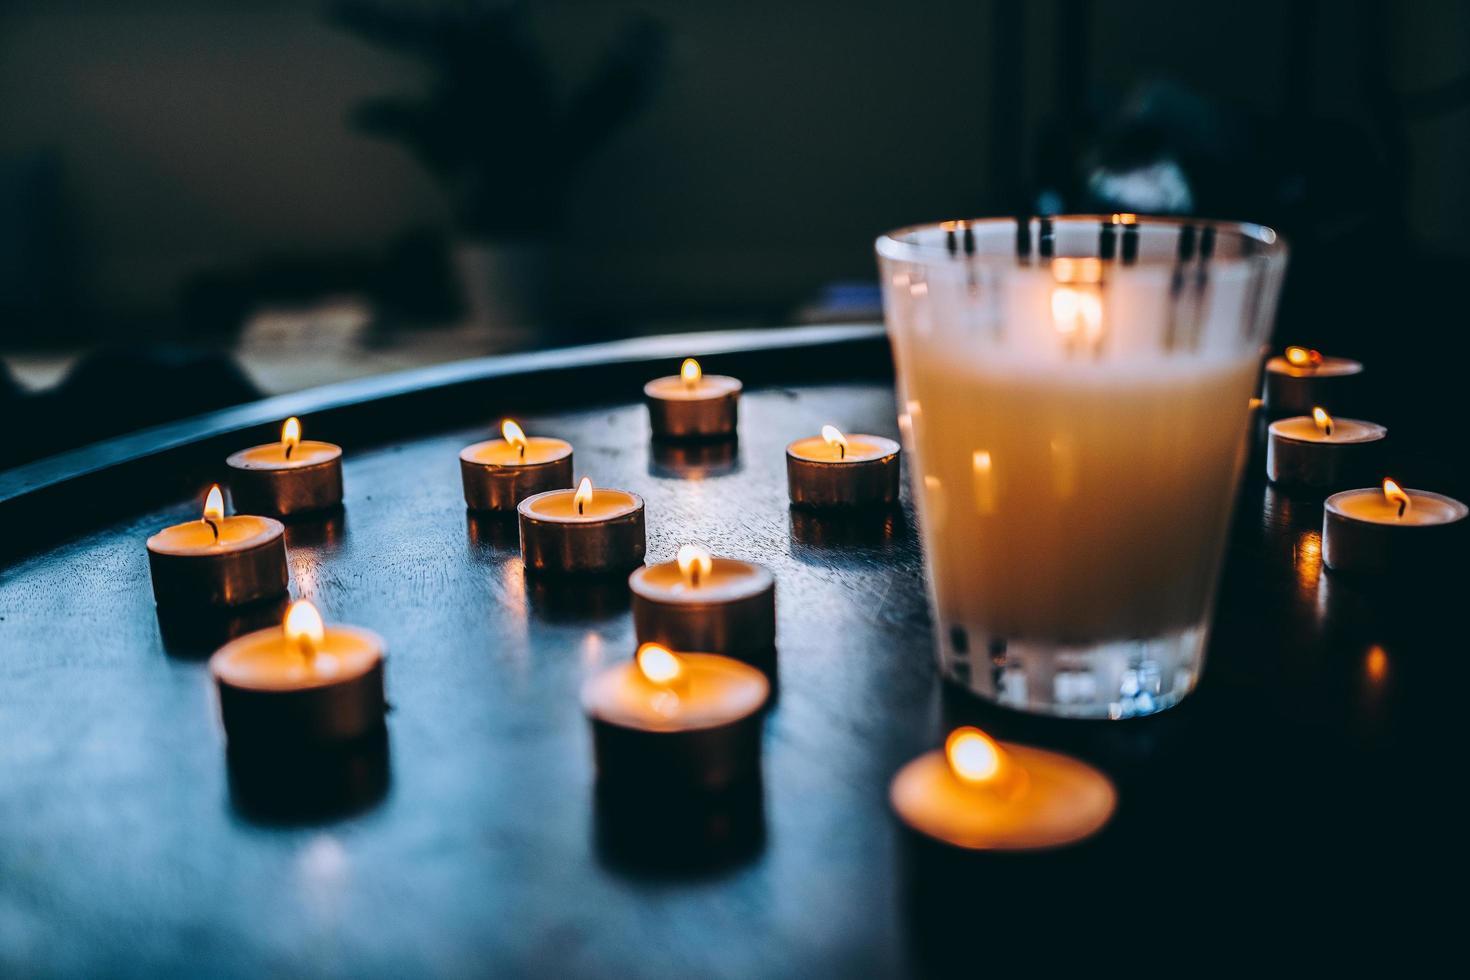 candele accese sul tavolo foto